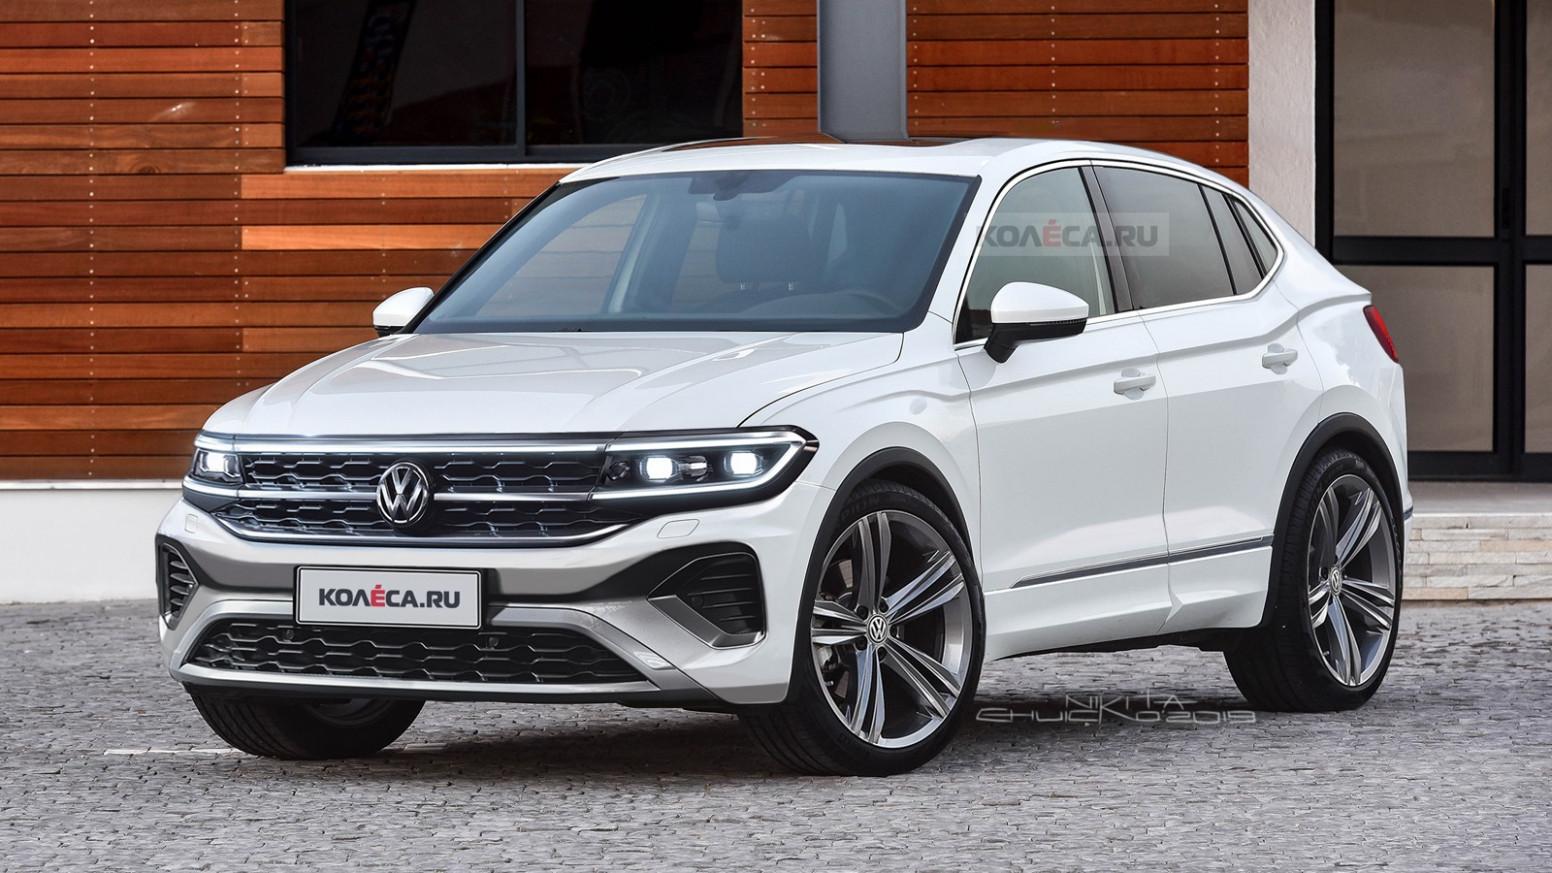 Redesign and Concept Volkswagen Tiguan 2022